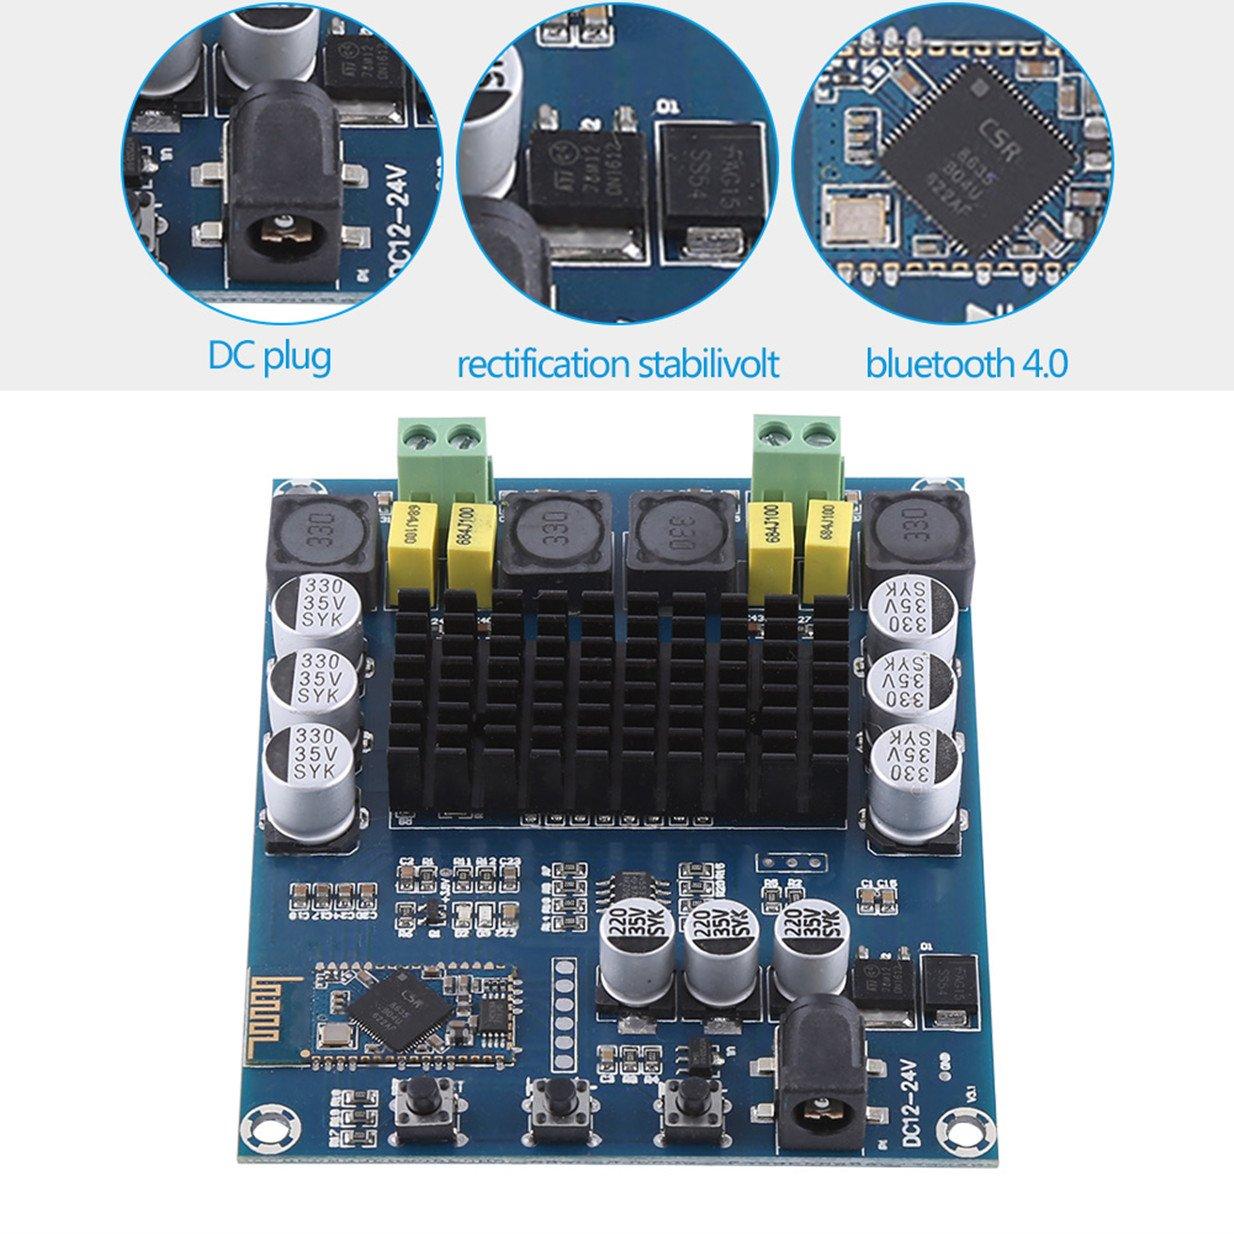 TPA3116D2 Wireless Bluetooth 4.0 Dual Channel 120W+120W Audio Receiver Digital Amplifier Board DC 12V-24V for DIY Home Sound Car Audio